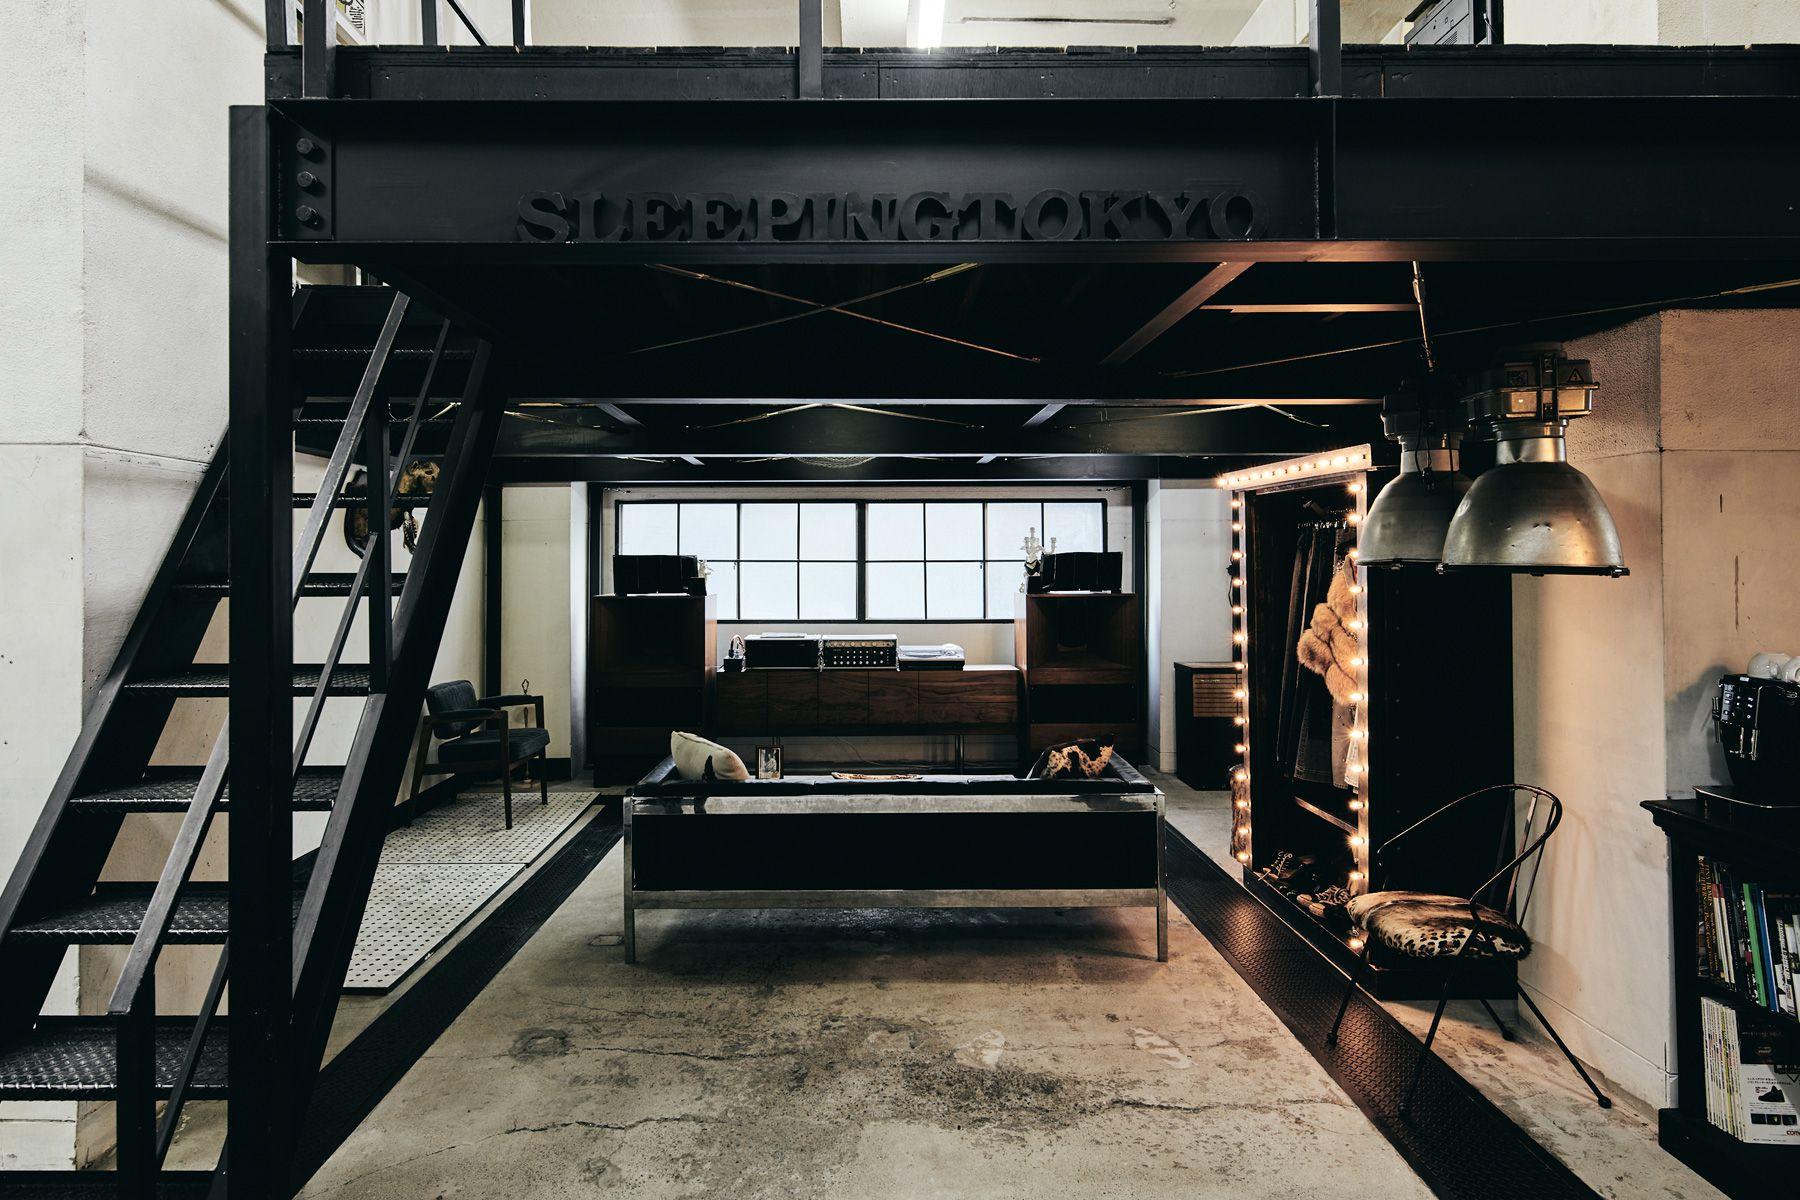 sleepingtokyo.studio (スリーピングトーキョー スタジオ)